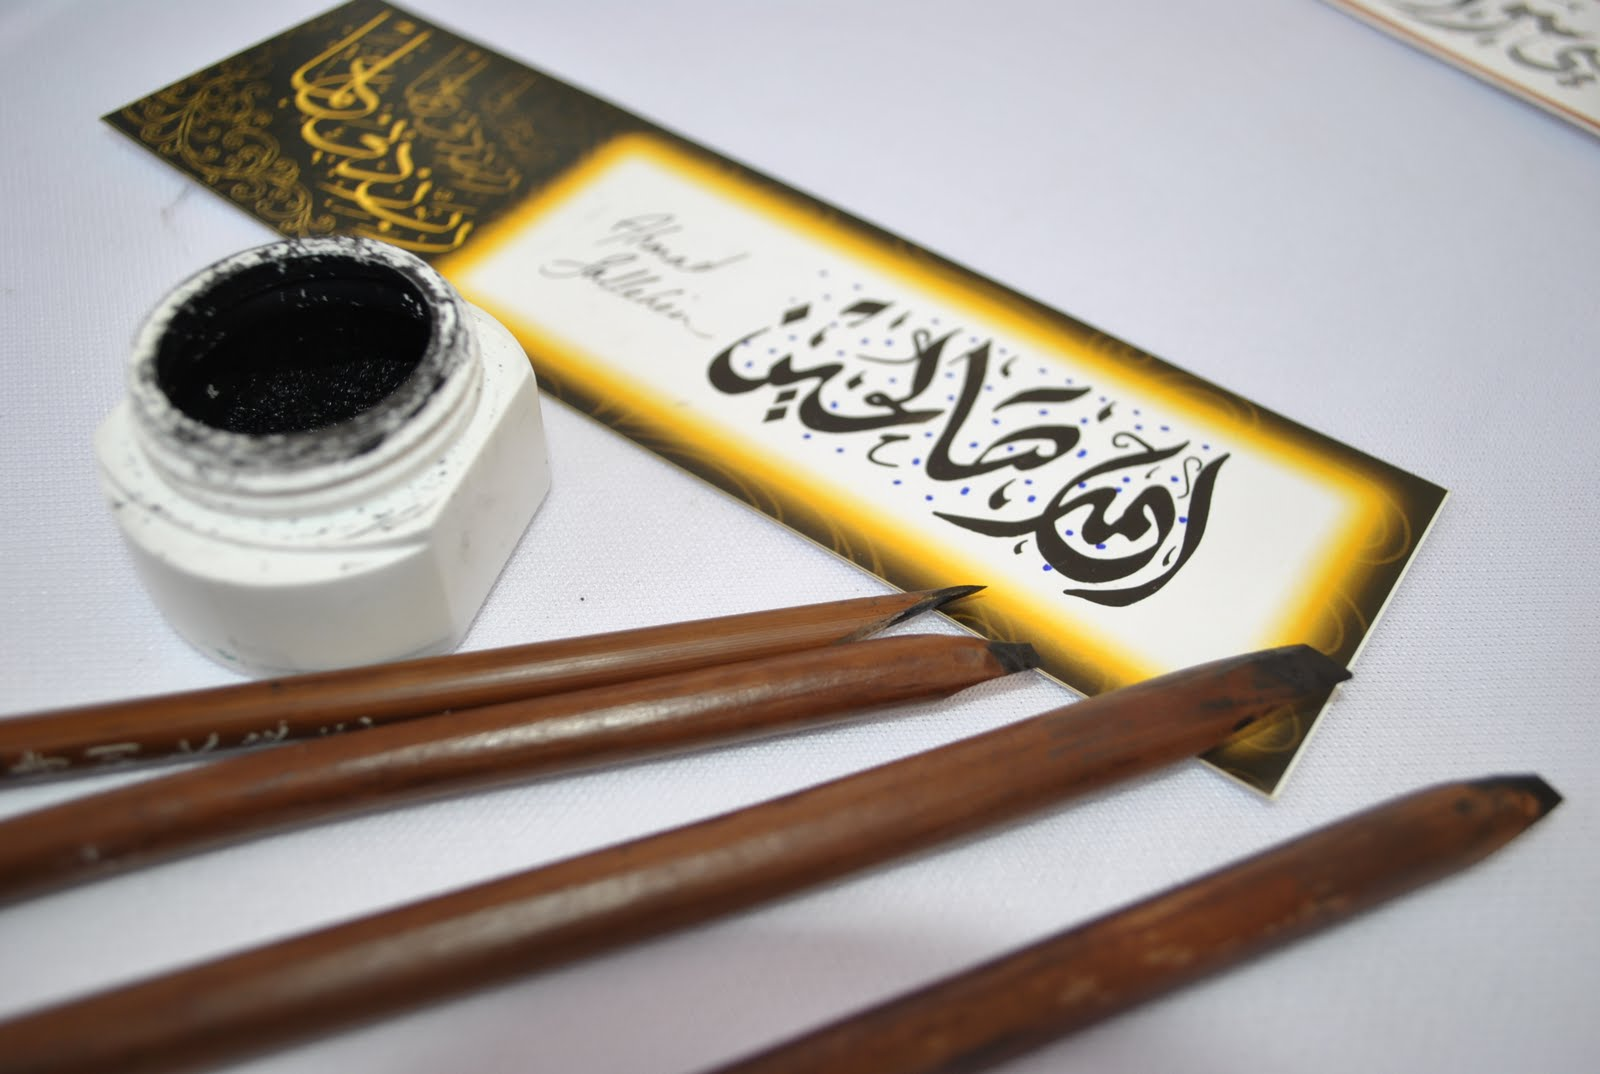 Gajirkaligrafi peralatan untuk penulisan khat